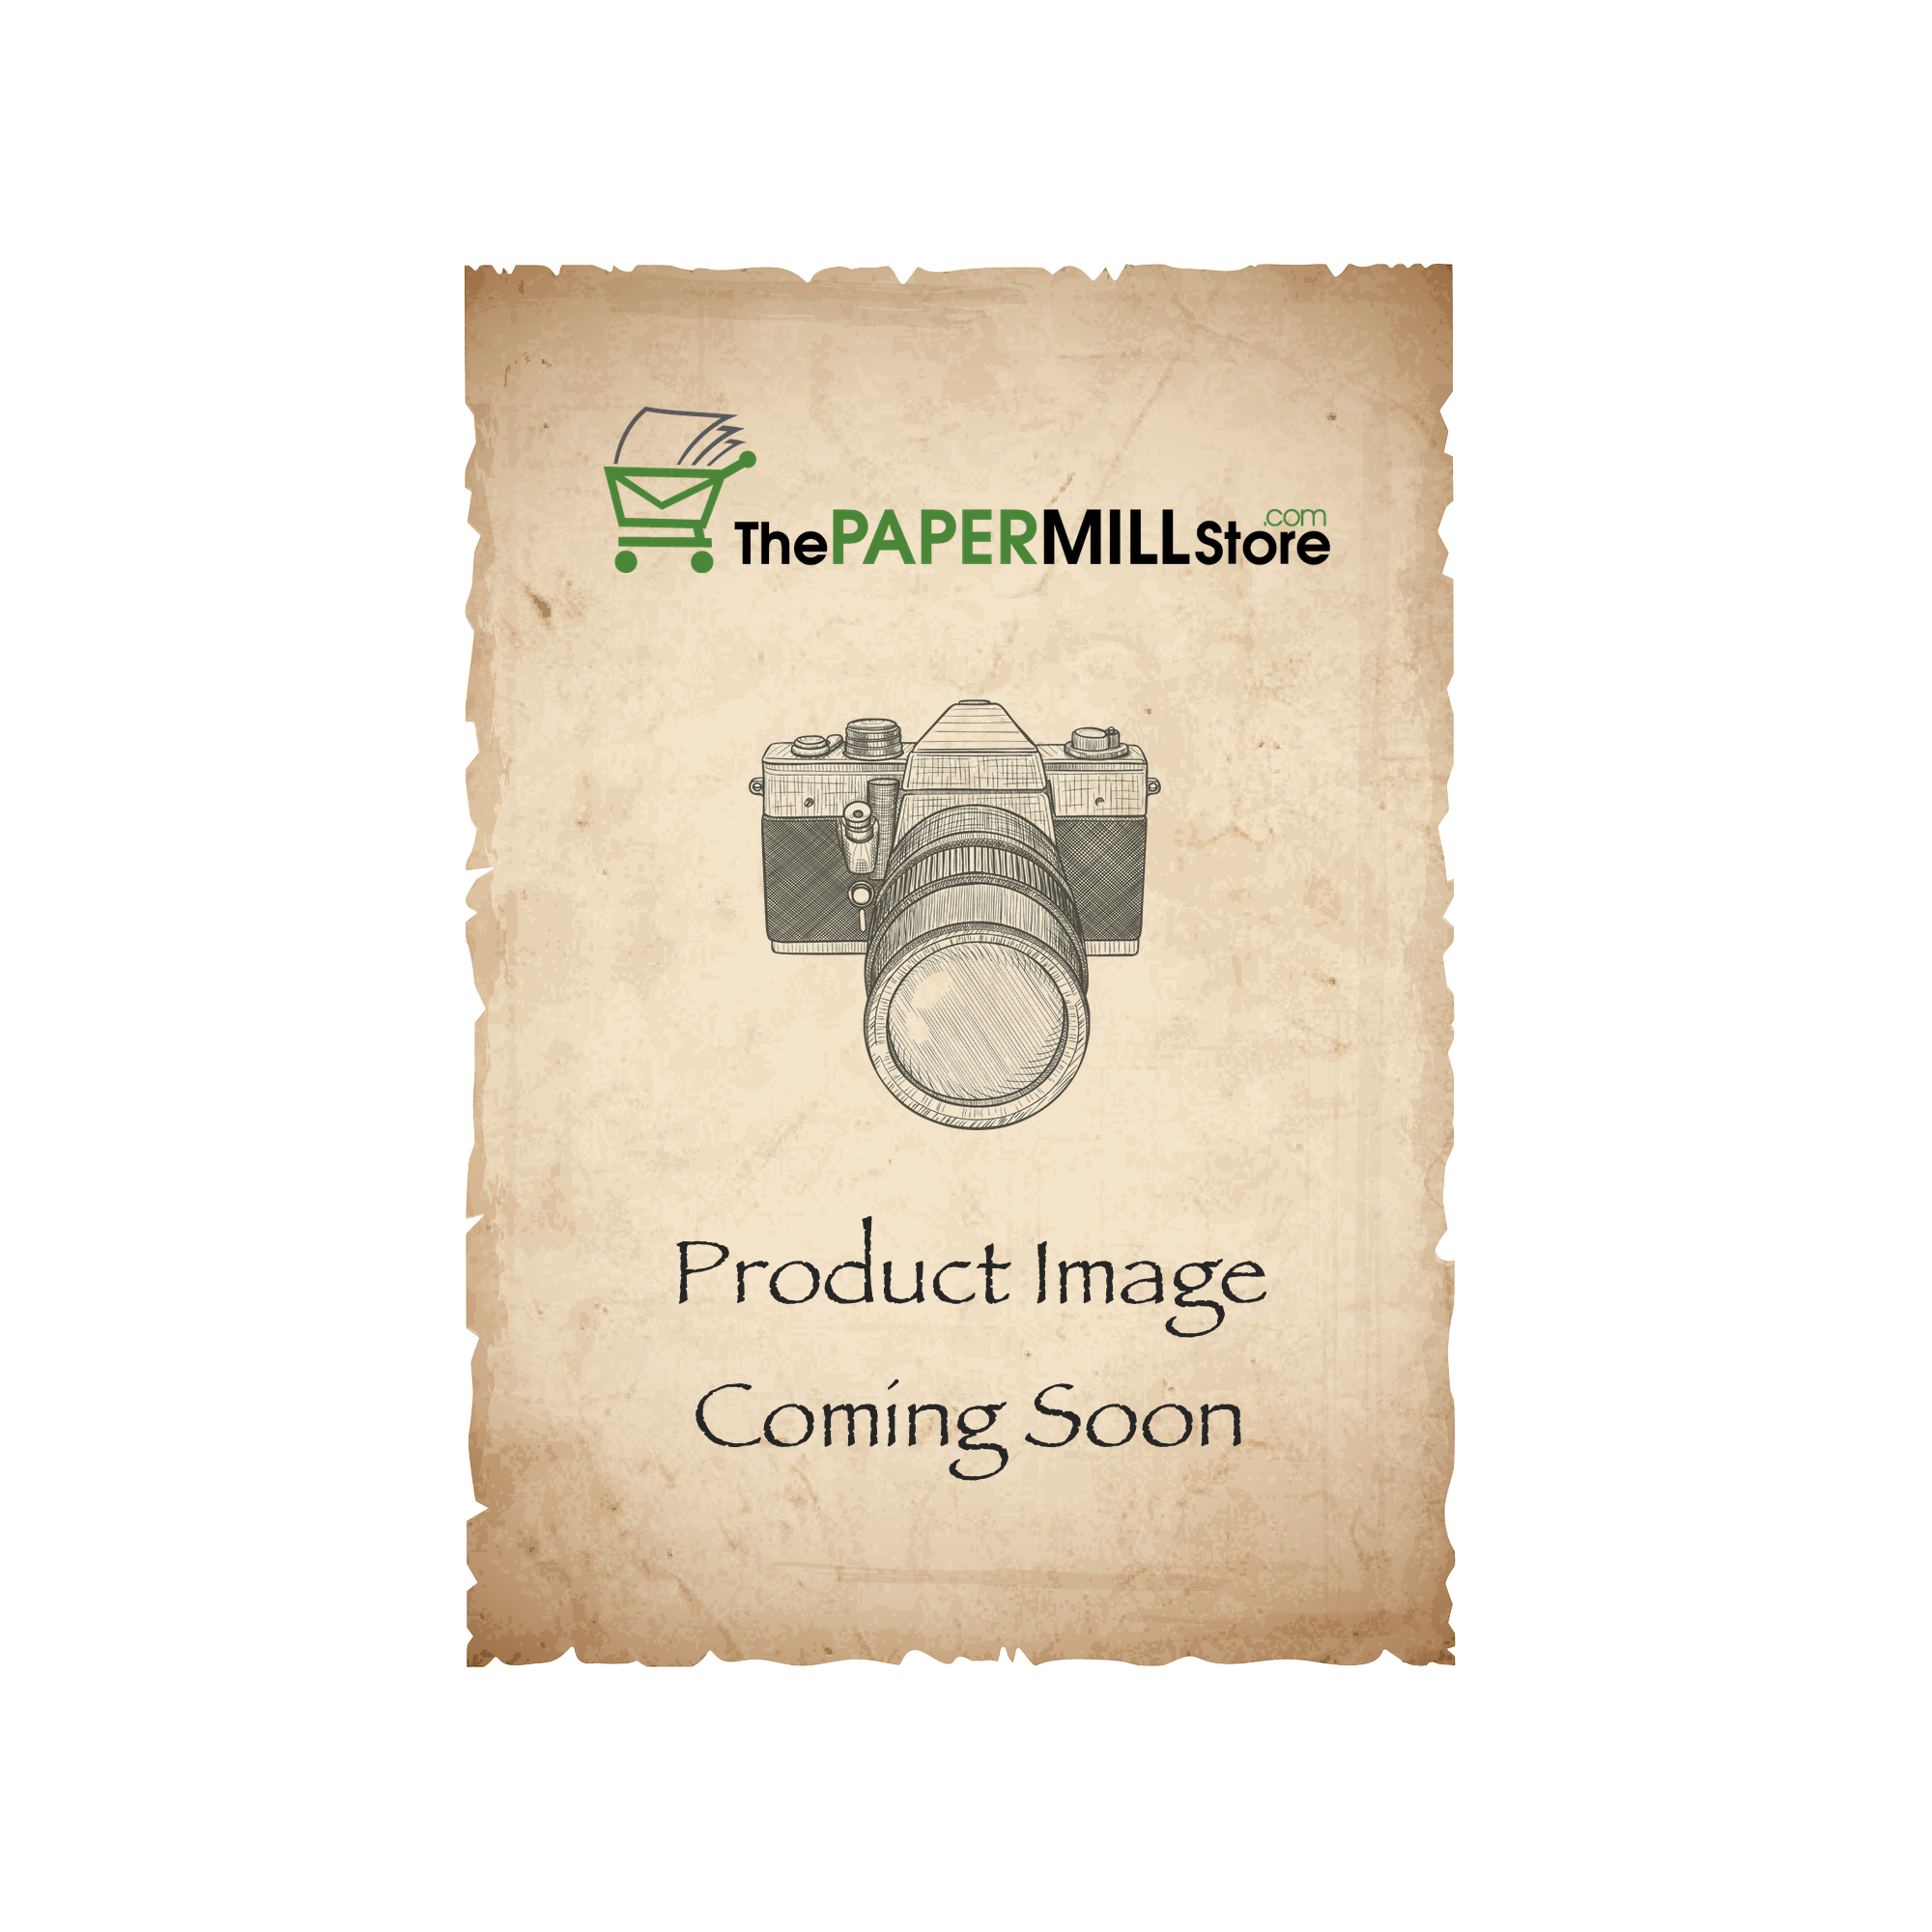 Ultrafelt Cool White Envelopes - No. 10 Commercial (4 1/8 x 9 1/2) 80 lb Text Premium Felt  30% Recycled 2500 per Carton